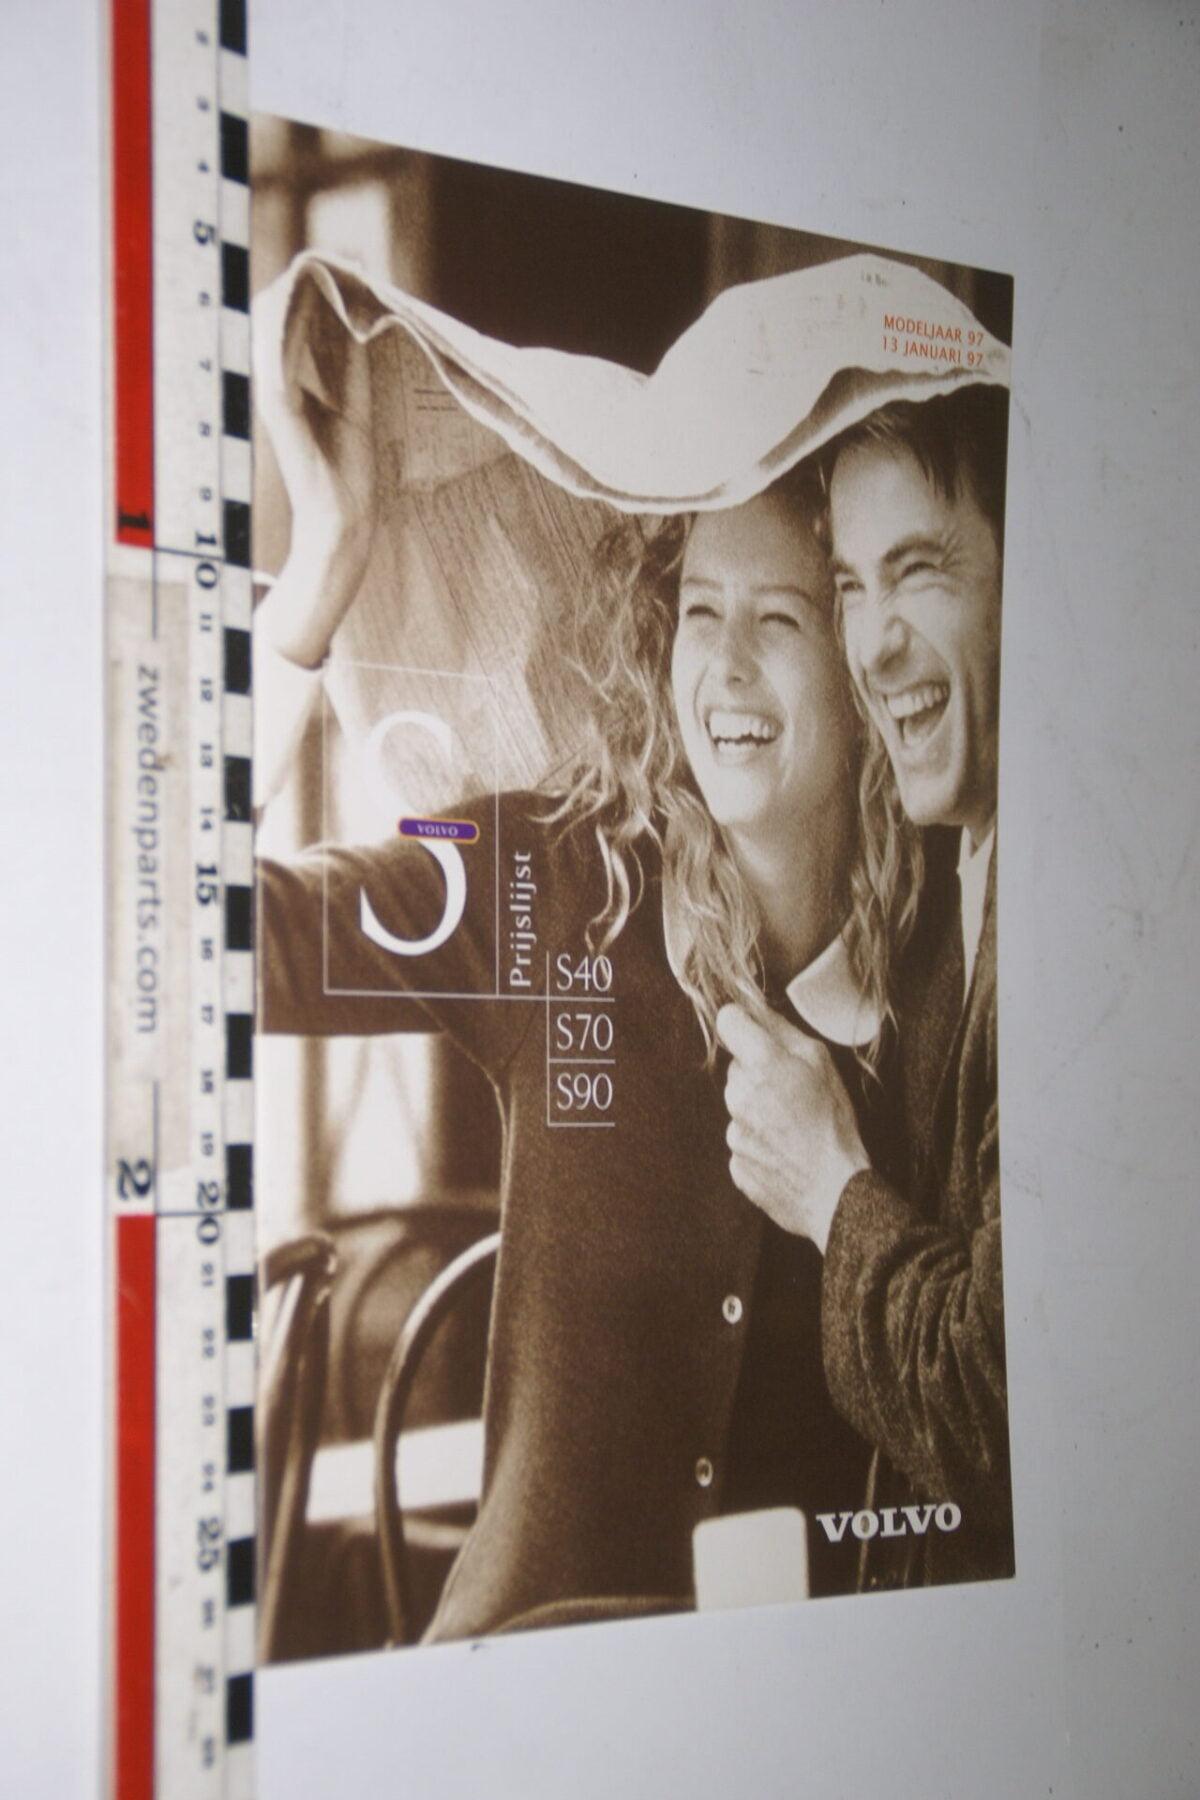 DSC04988 1997 originele brochure nr. VO19701-13 Volvo S40 S70 S90-f43e150a